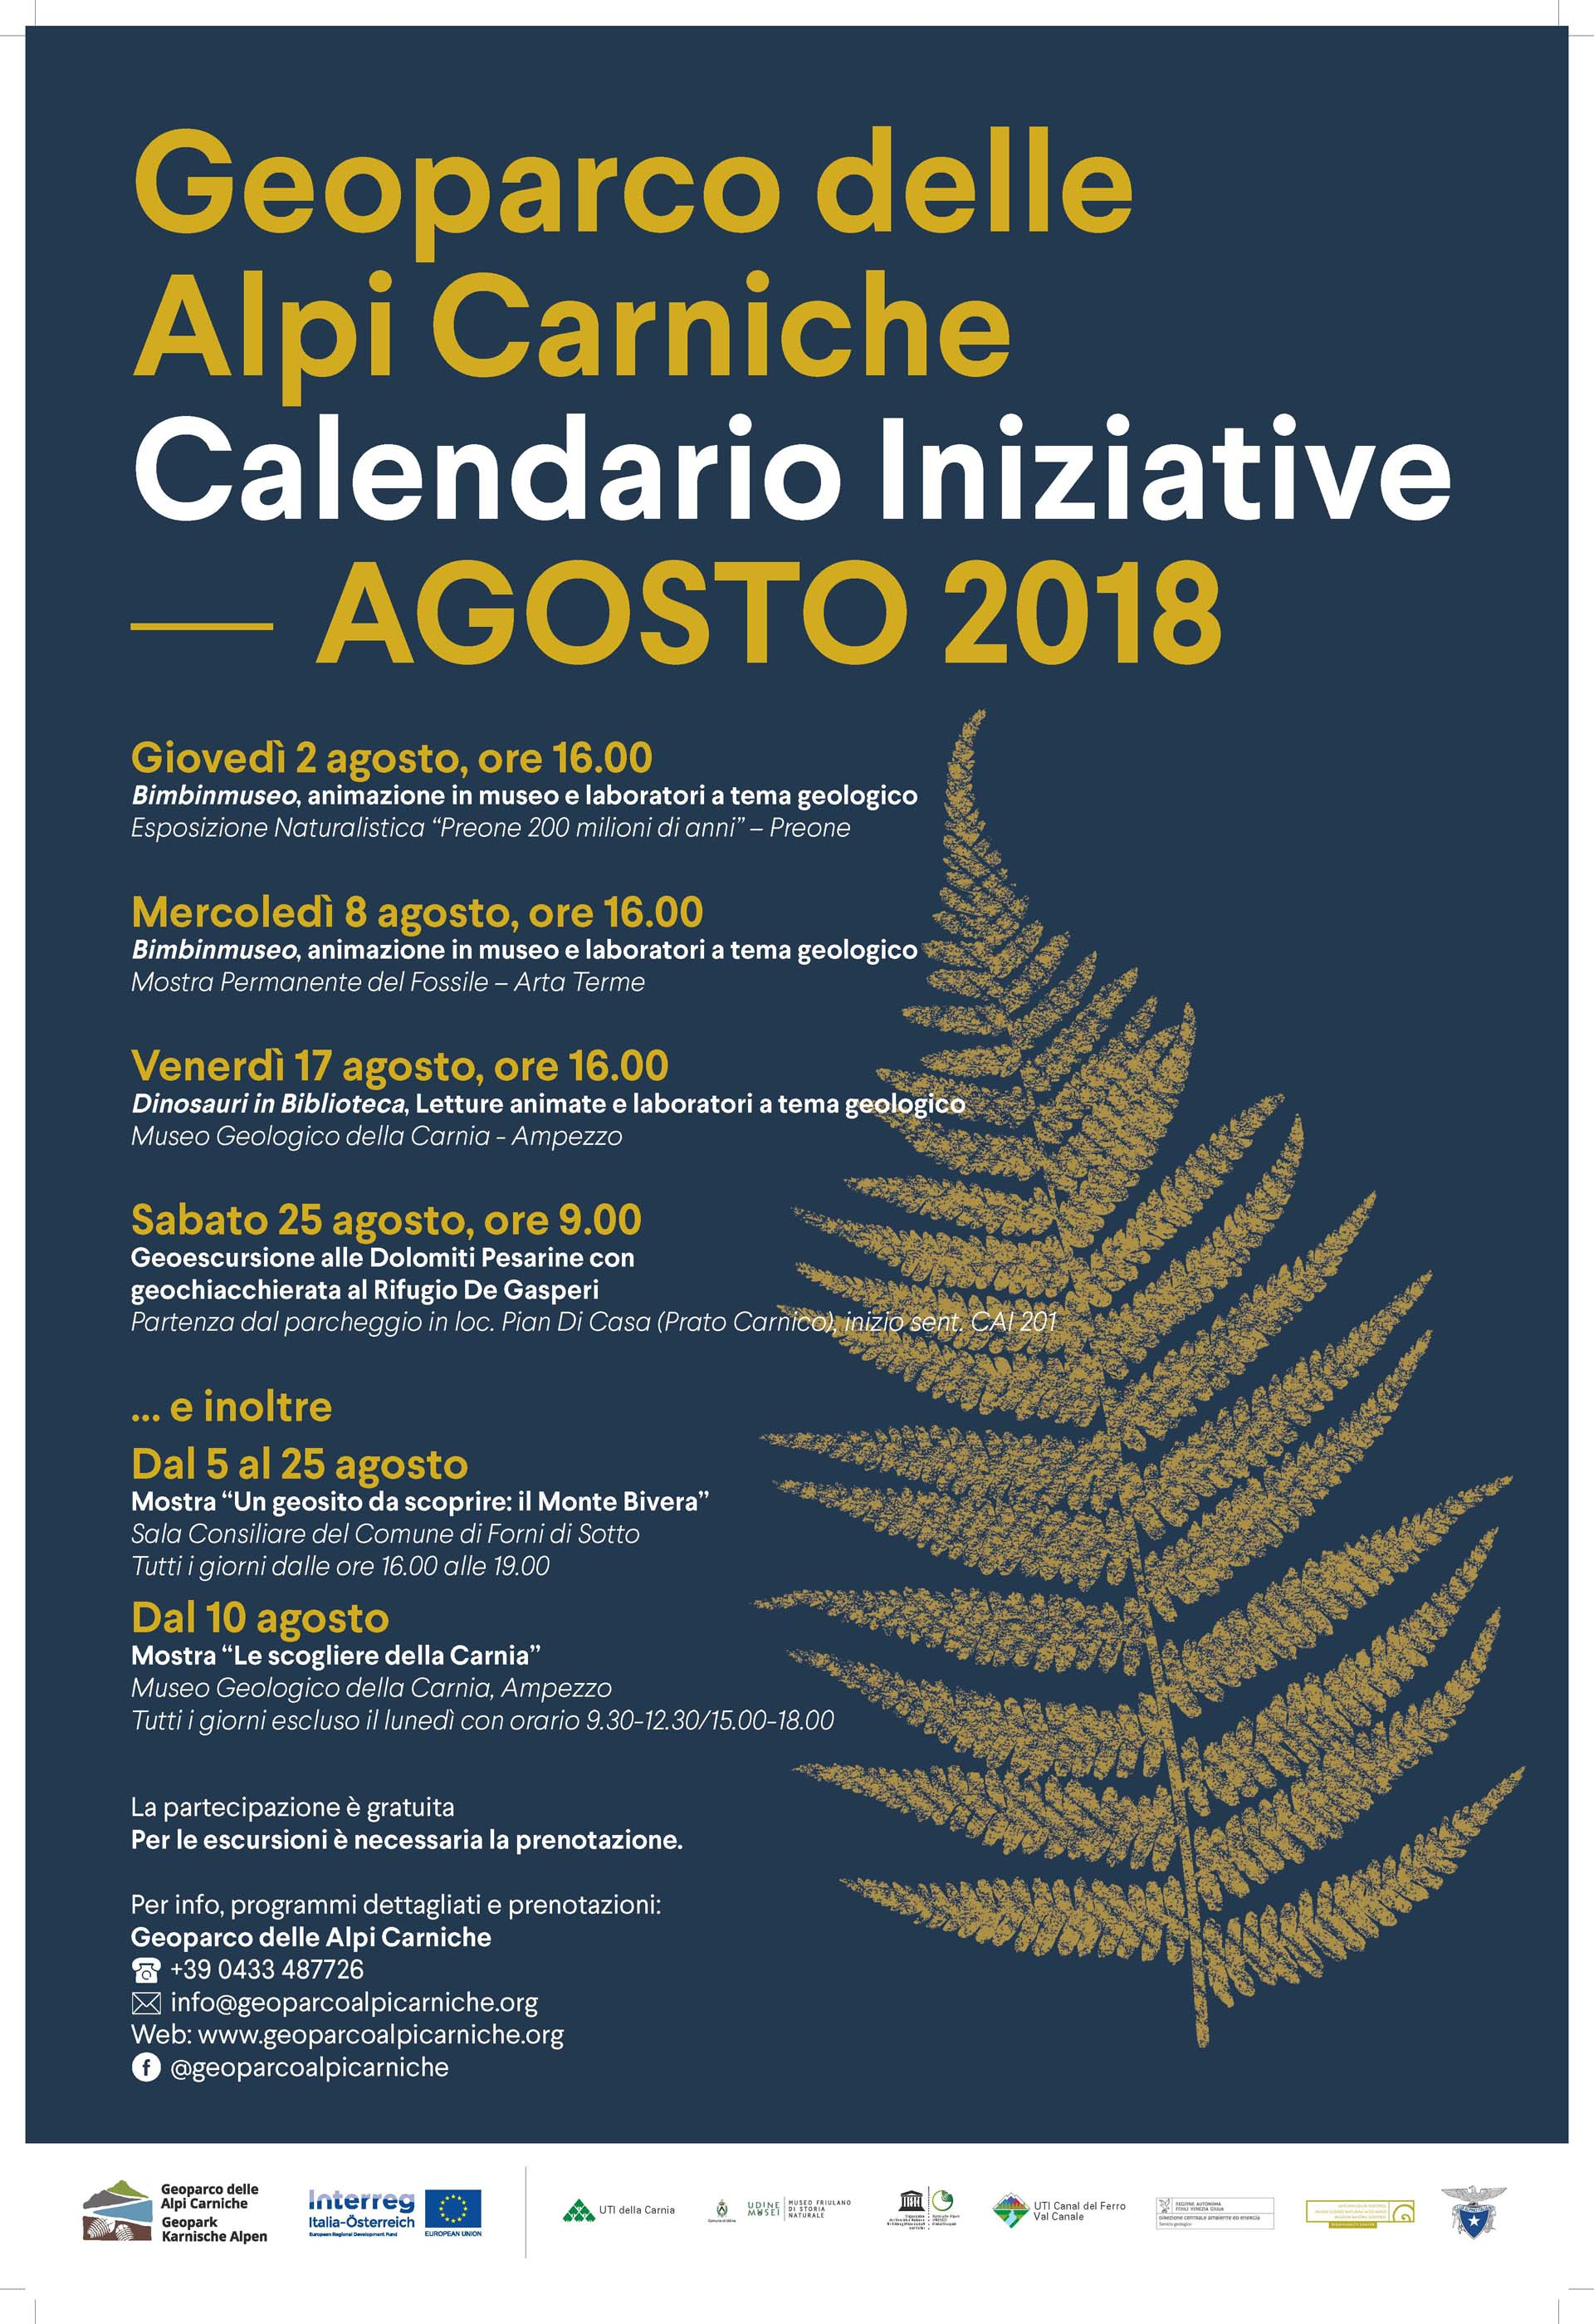 locandina geoparco 08-2018lr